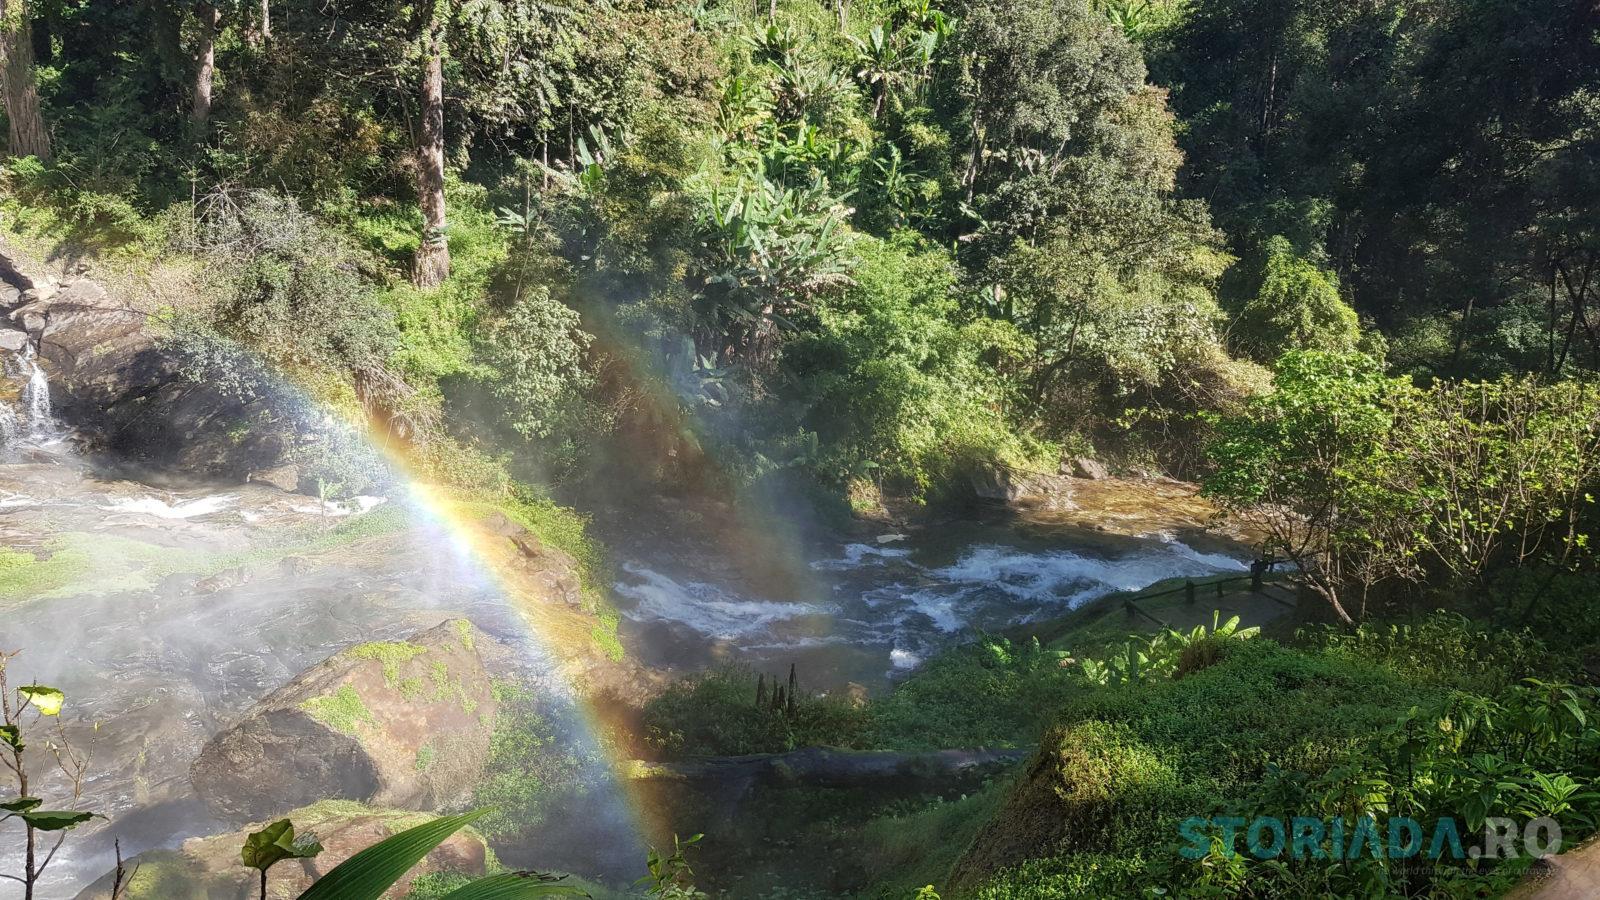 Waachiratarn Waterfall Chiang Mai, Thailand